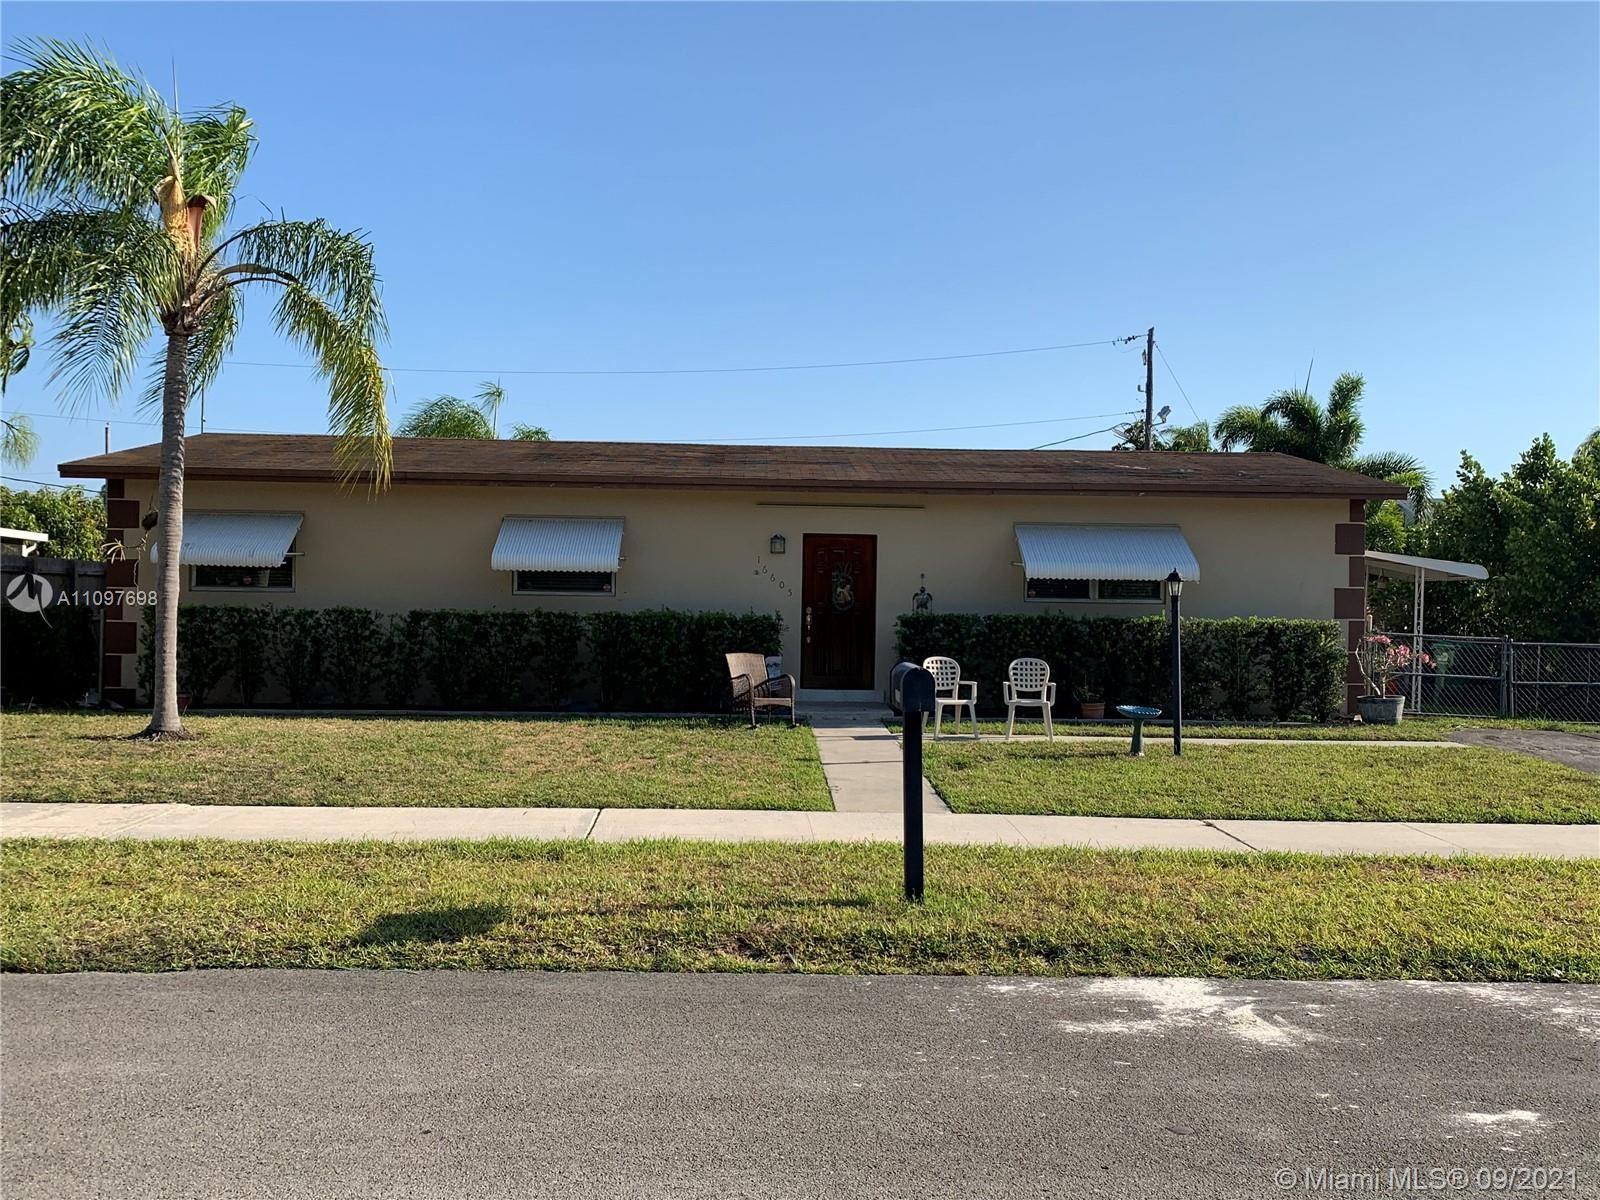 16605 SW 295th St, Homestead, FL 33033 - #: A11097698